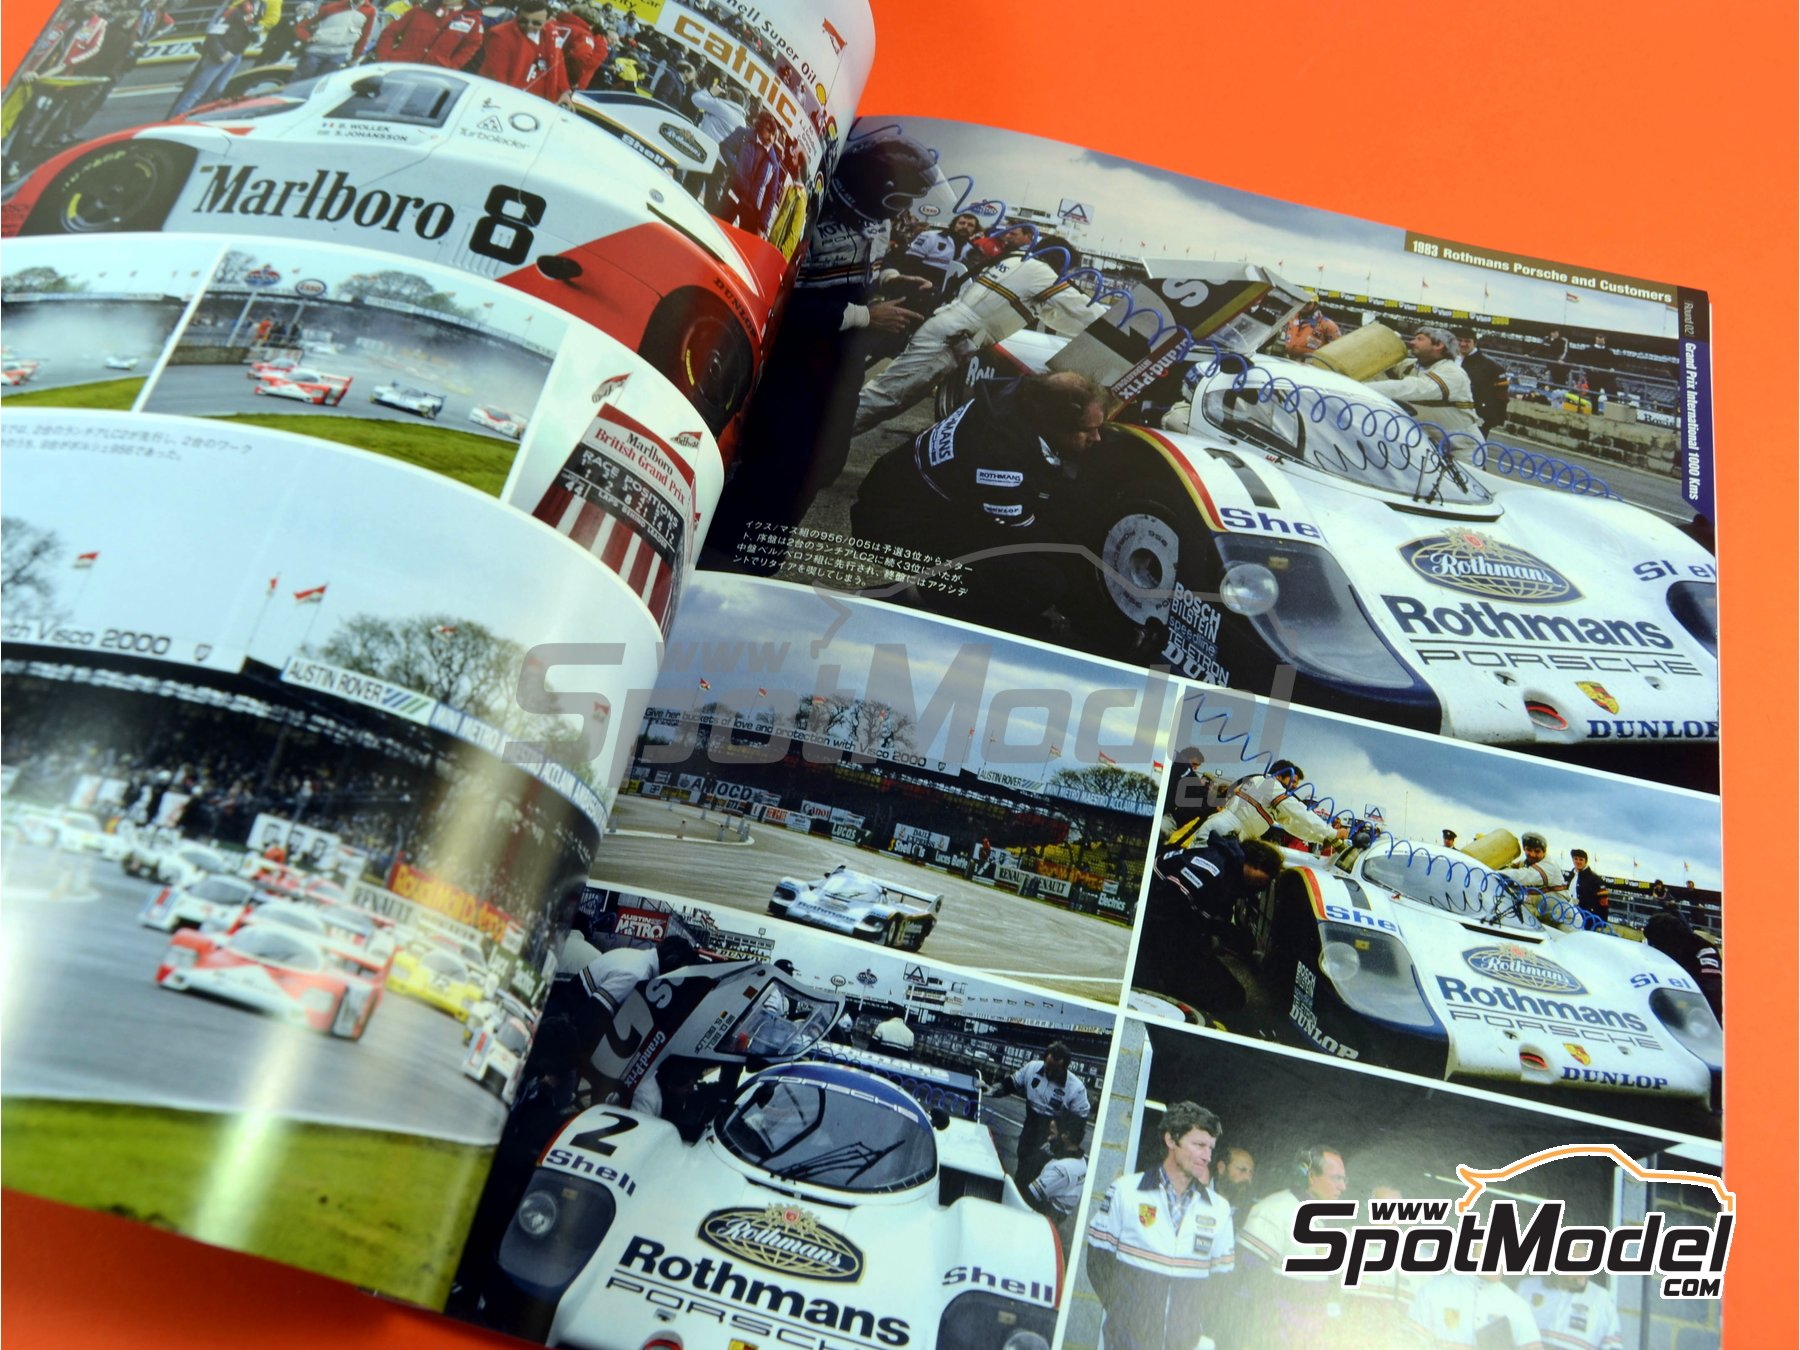 Image 5: Joe Honda Sportscar Spectacles - Porsche 956 - 24 Horas de Le Mans, 1000 Kilómetros de Suzuka, 6 Horas de Silverstone, 6 Horas de Fuji 1982, 1983, 1984, 1985 y 1985 | Libro de referencia fabricado por Model Factory Hiro (ref.MFH-SS007)